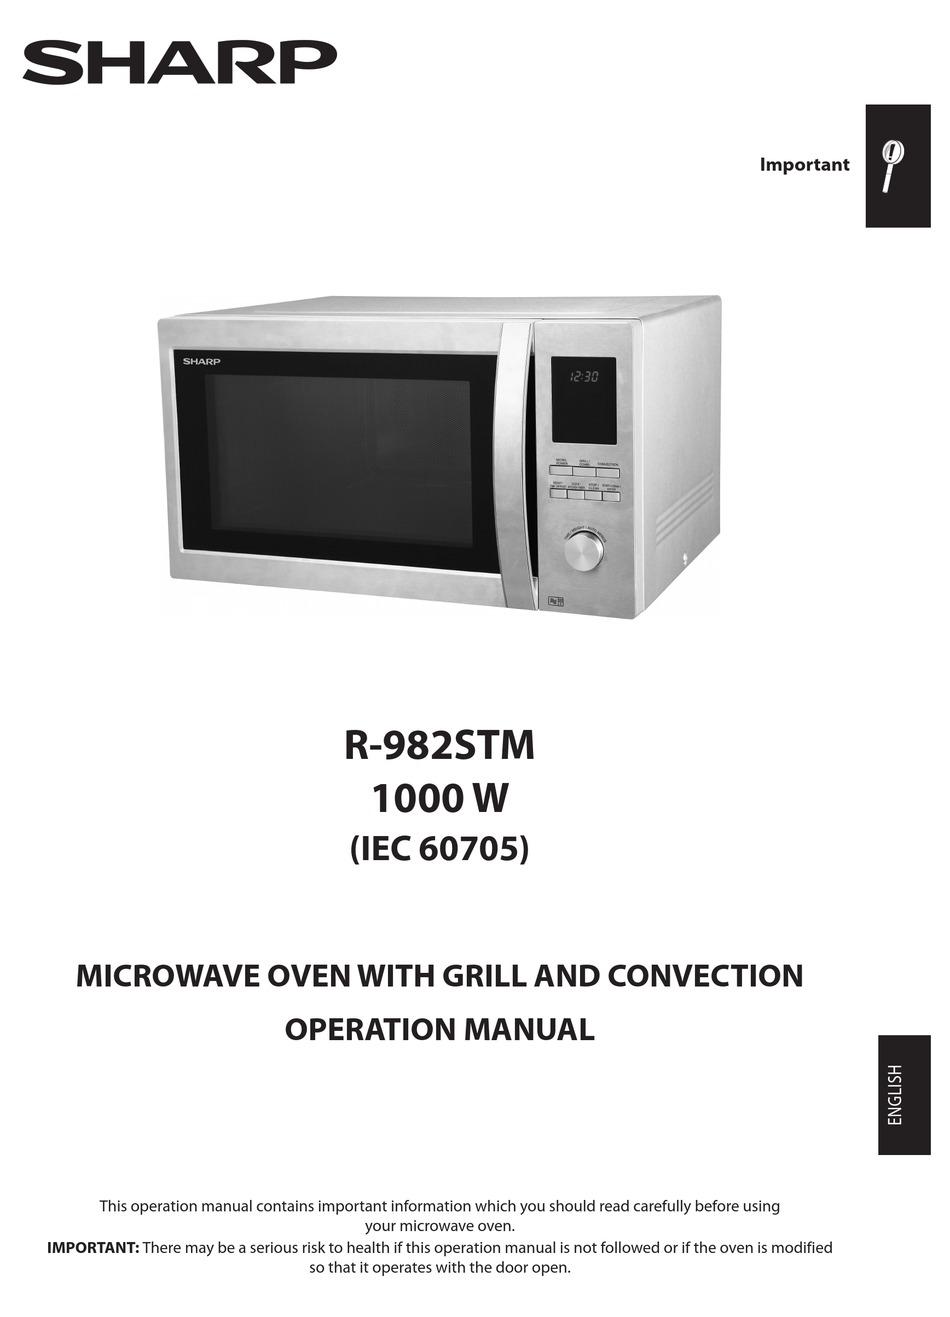 sharp r 982stm operation manual pdf